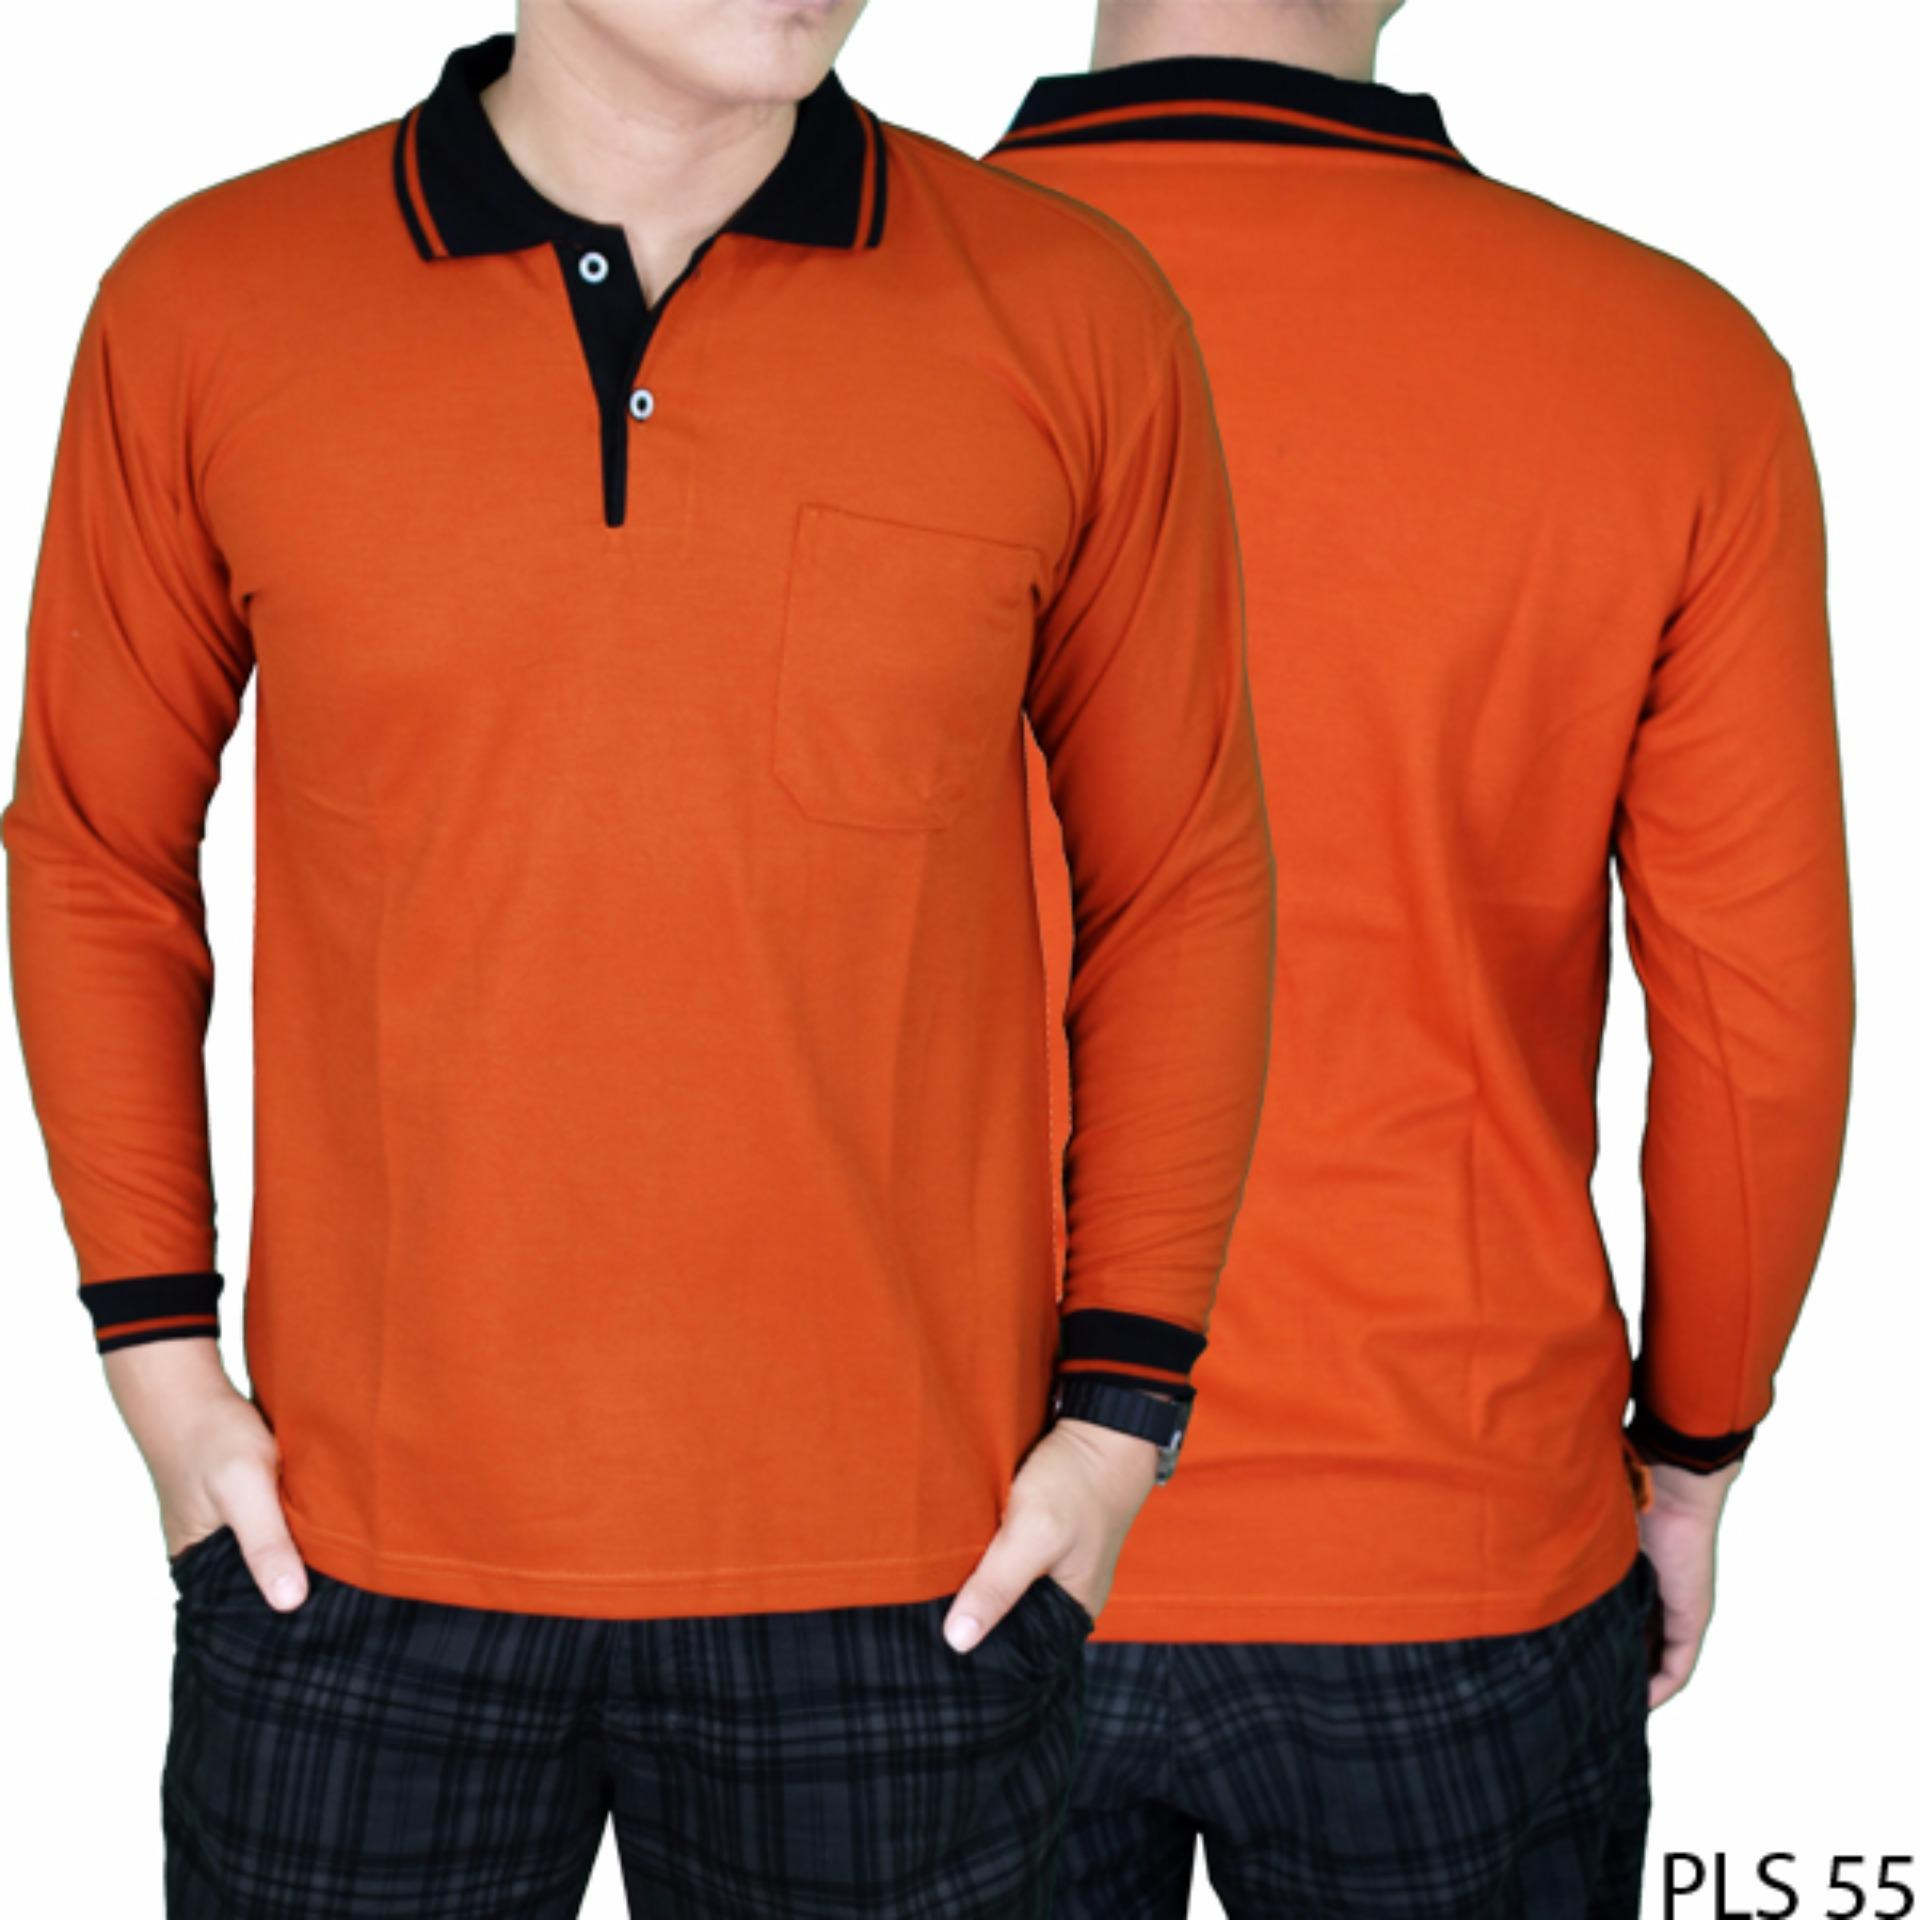 Gudang Fashion Sweater Pria Elegan Abu WIKIPRICE Source · Gudang Fashion Polo Shirt Pria Lengan Panjang